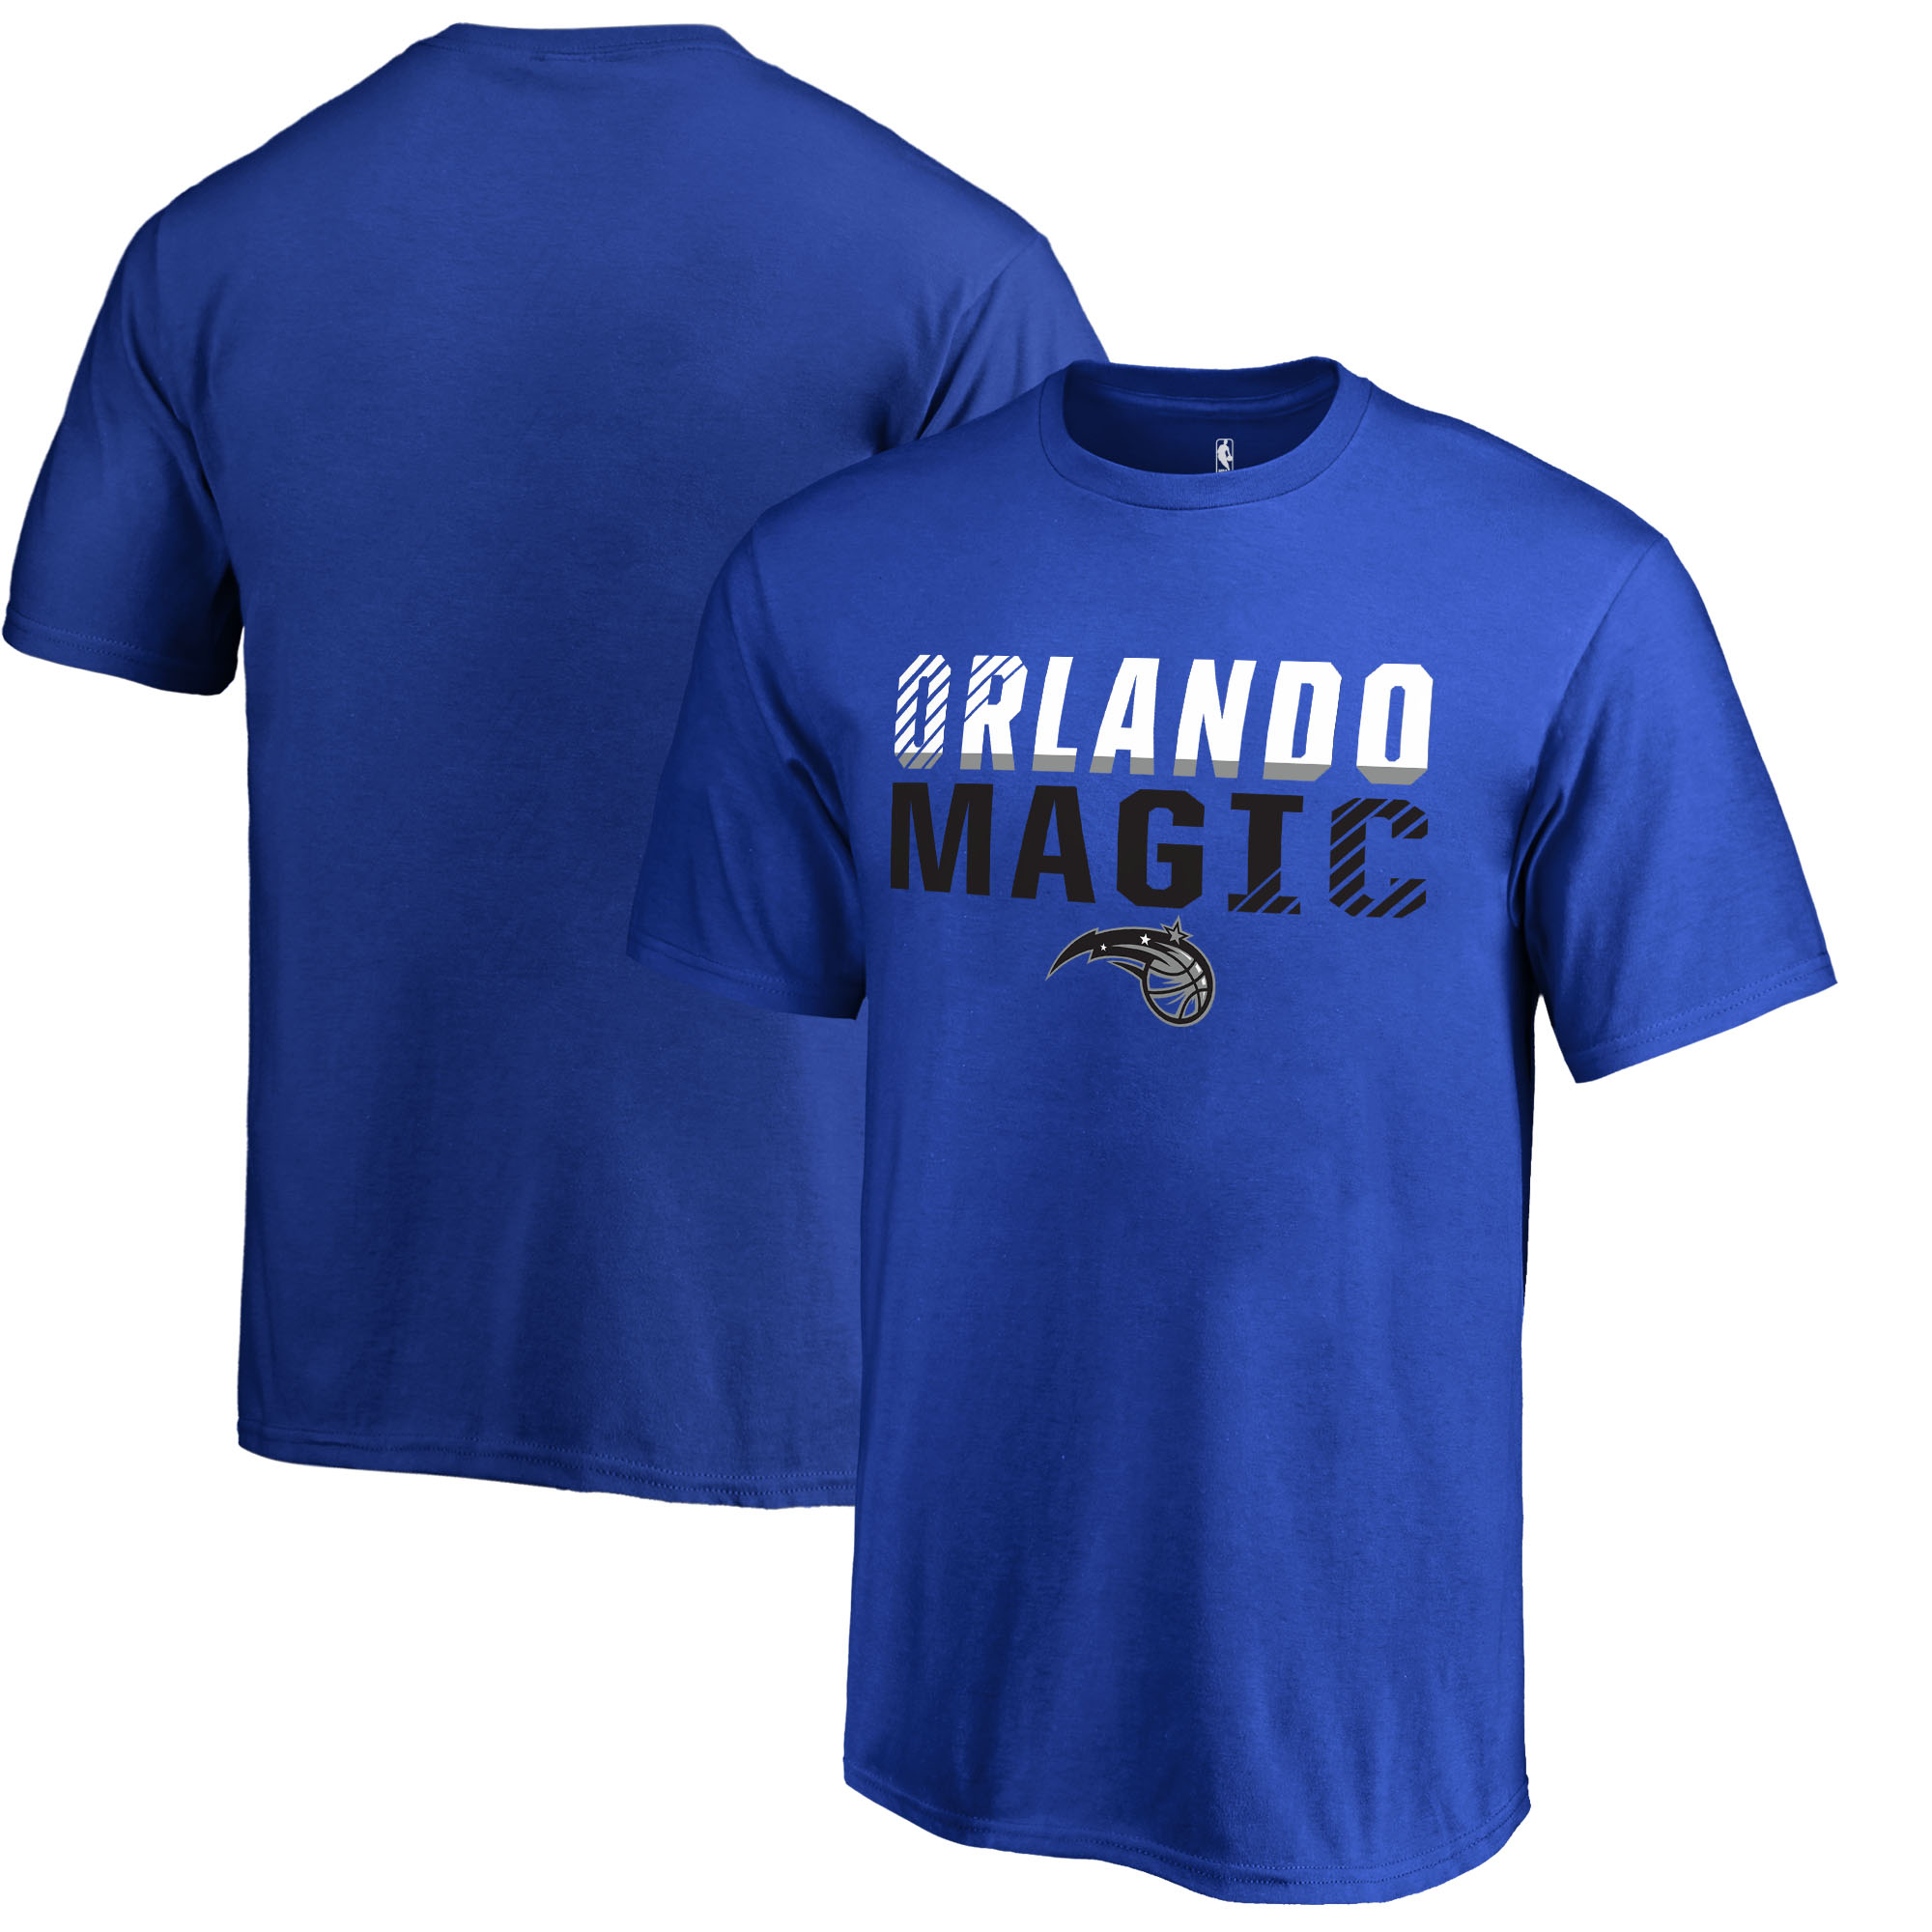 Orlando Magic Fanatics Branded Youth Fade Out T-Shirt - Blue